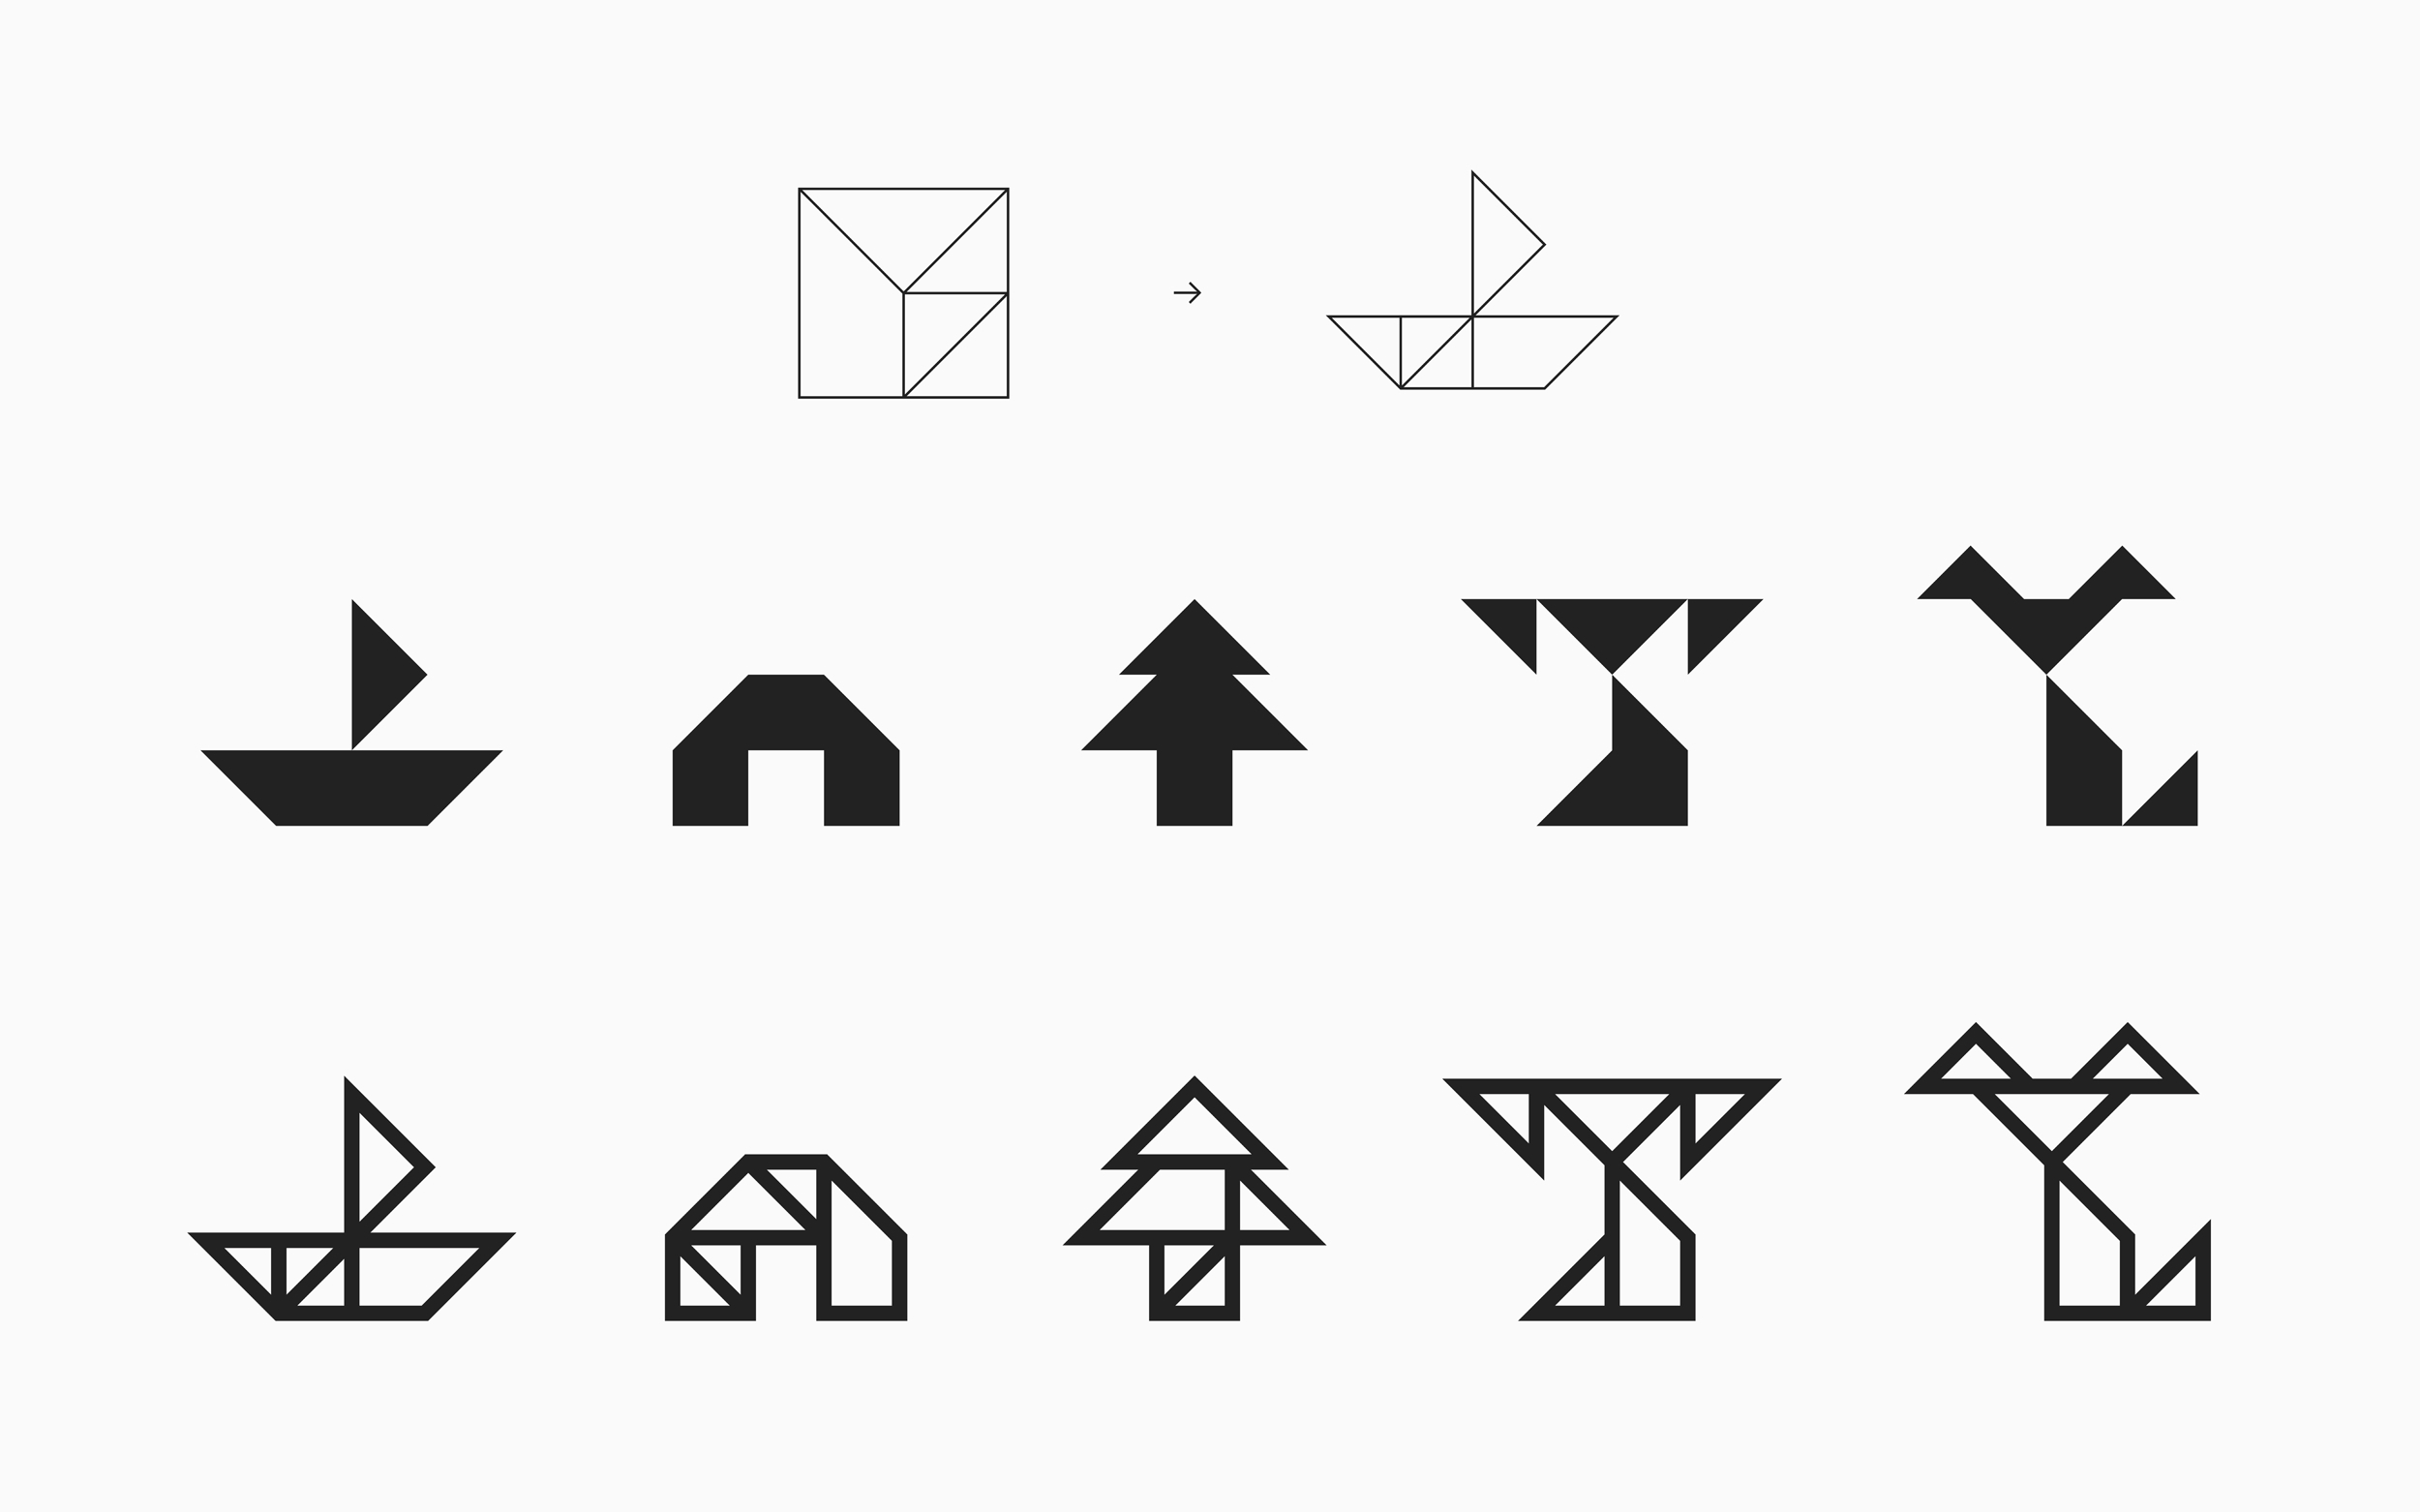 yore-cast-iron-design-illustrations.jpg